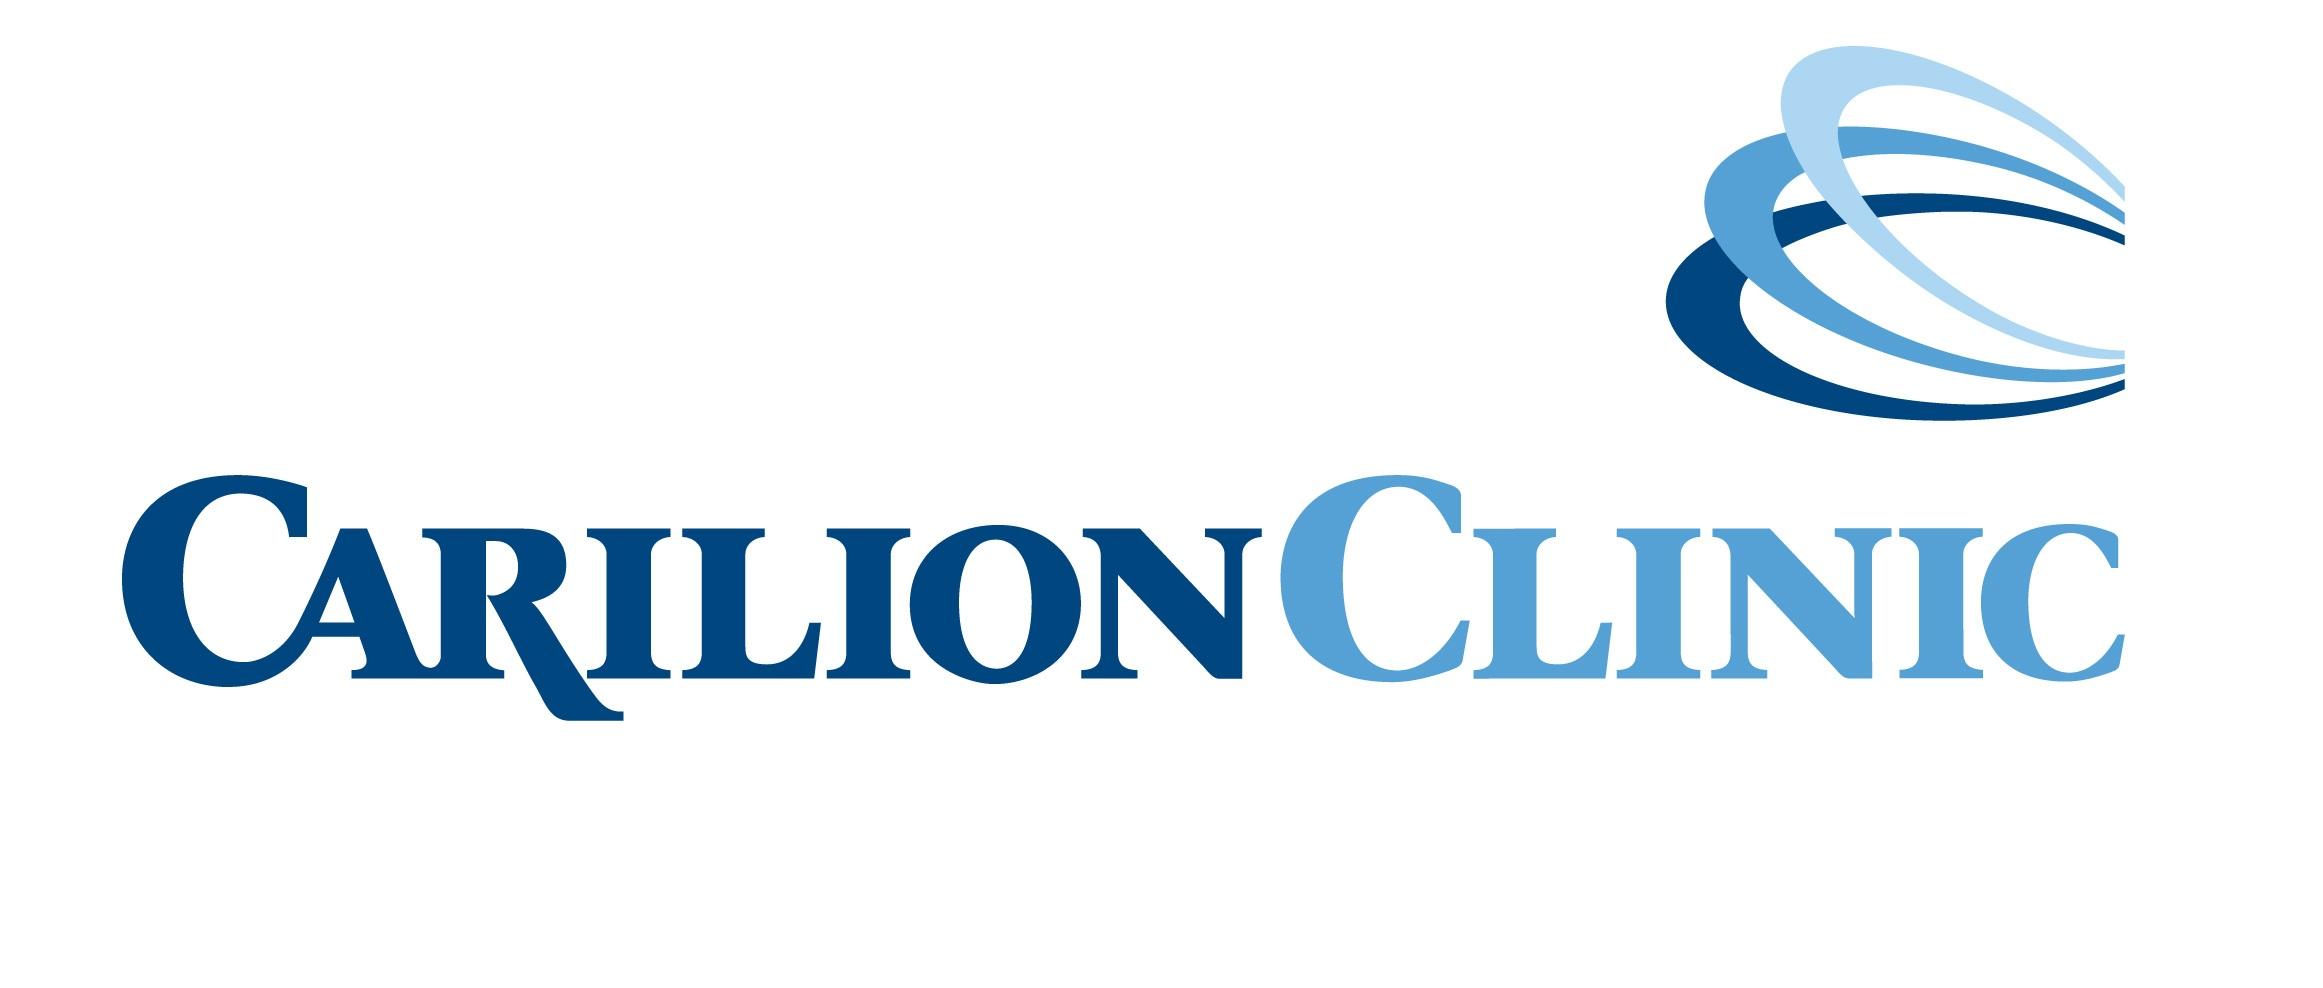 Carilion-Clinic_1530568885110.jpg